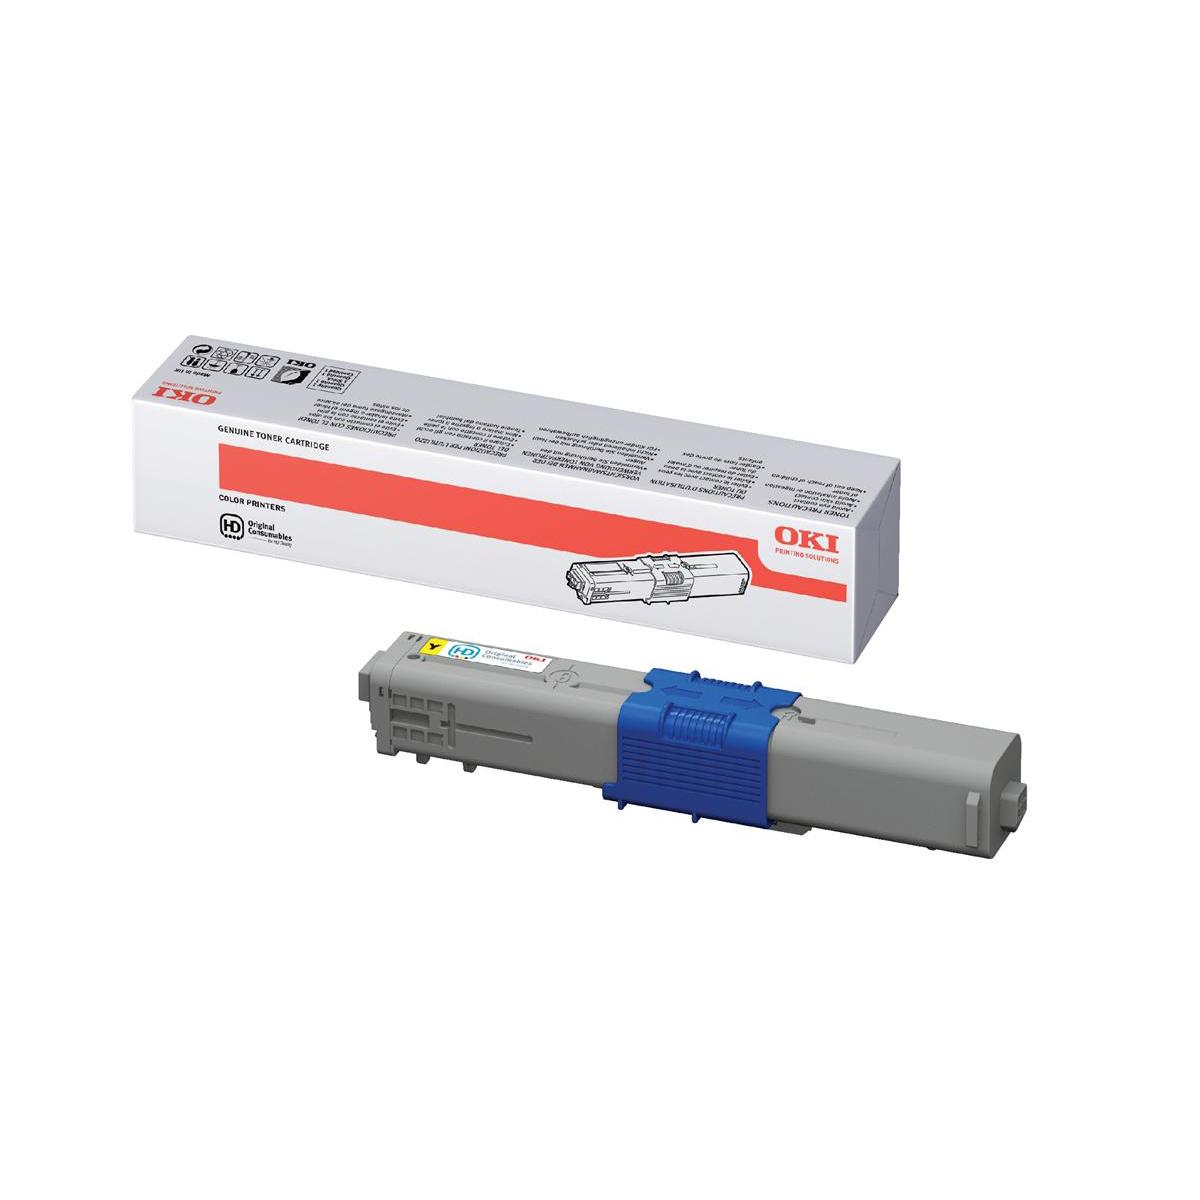 Ink And Toner Printer Fax Copier Supplies Photoconductors Hp 43x High Yield Black Original Laserjet Cartridge C8543x Oki Laser Page Life 5000pp Yellow Ref 44469722